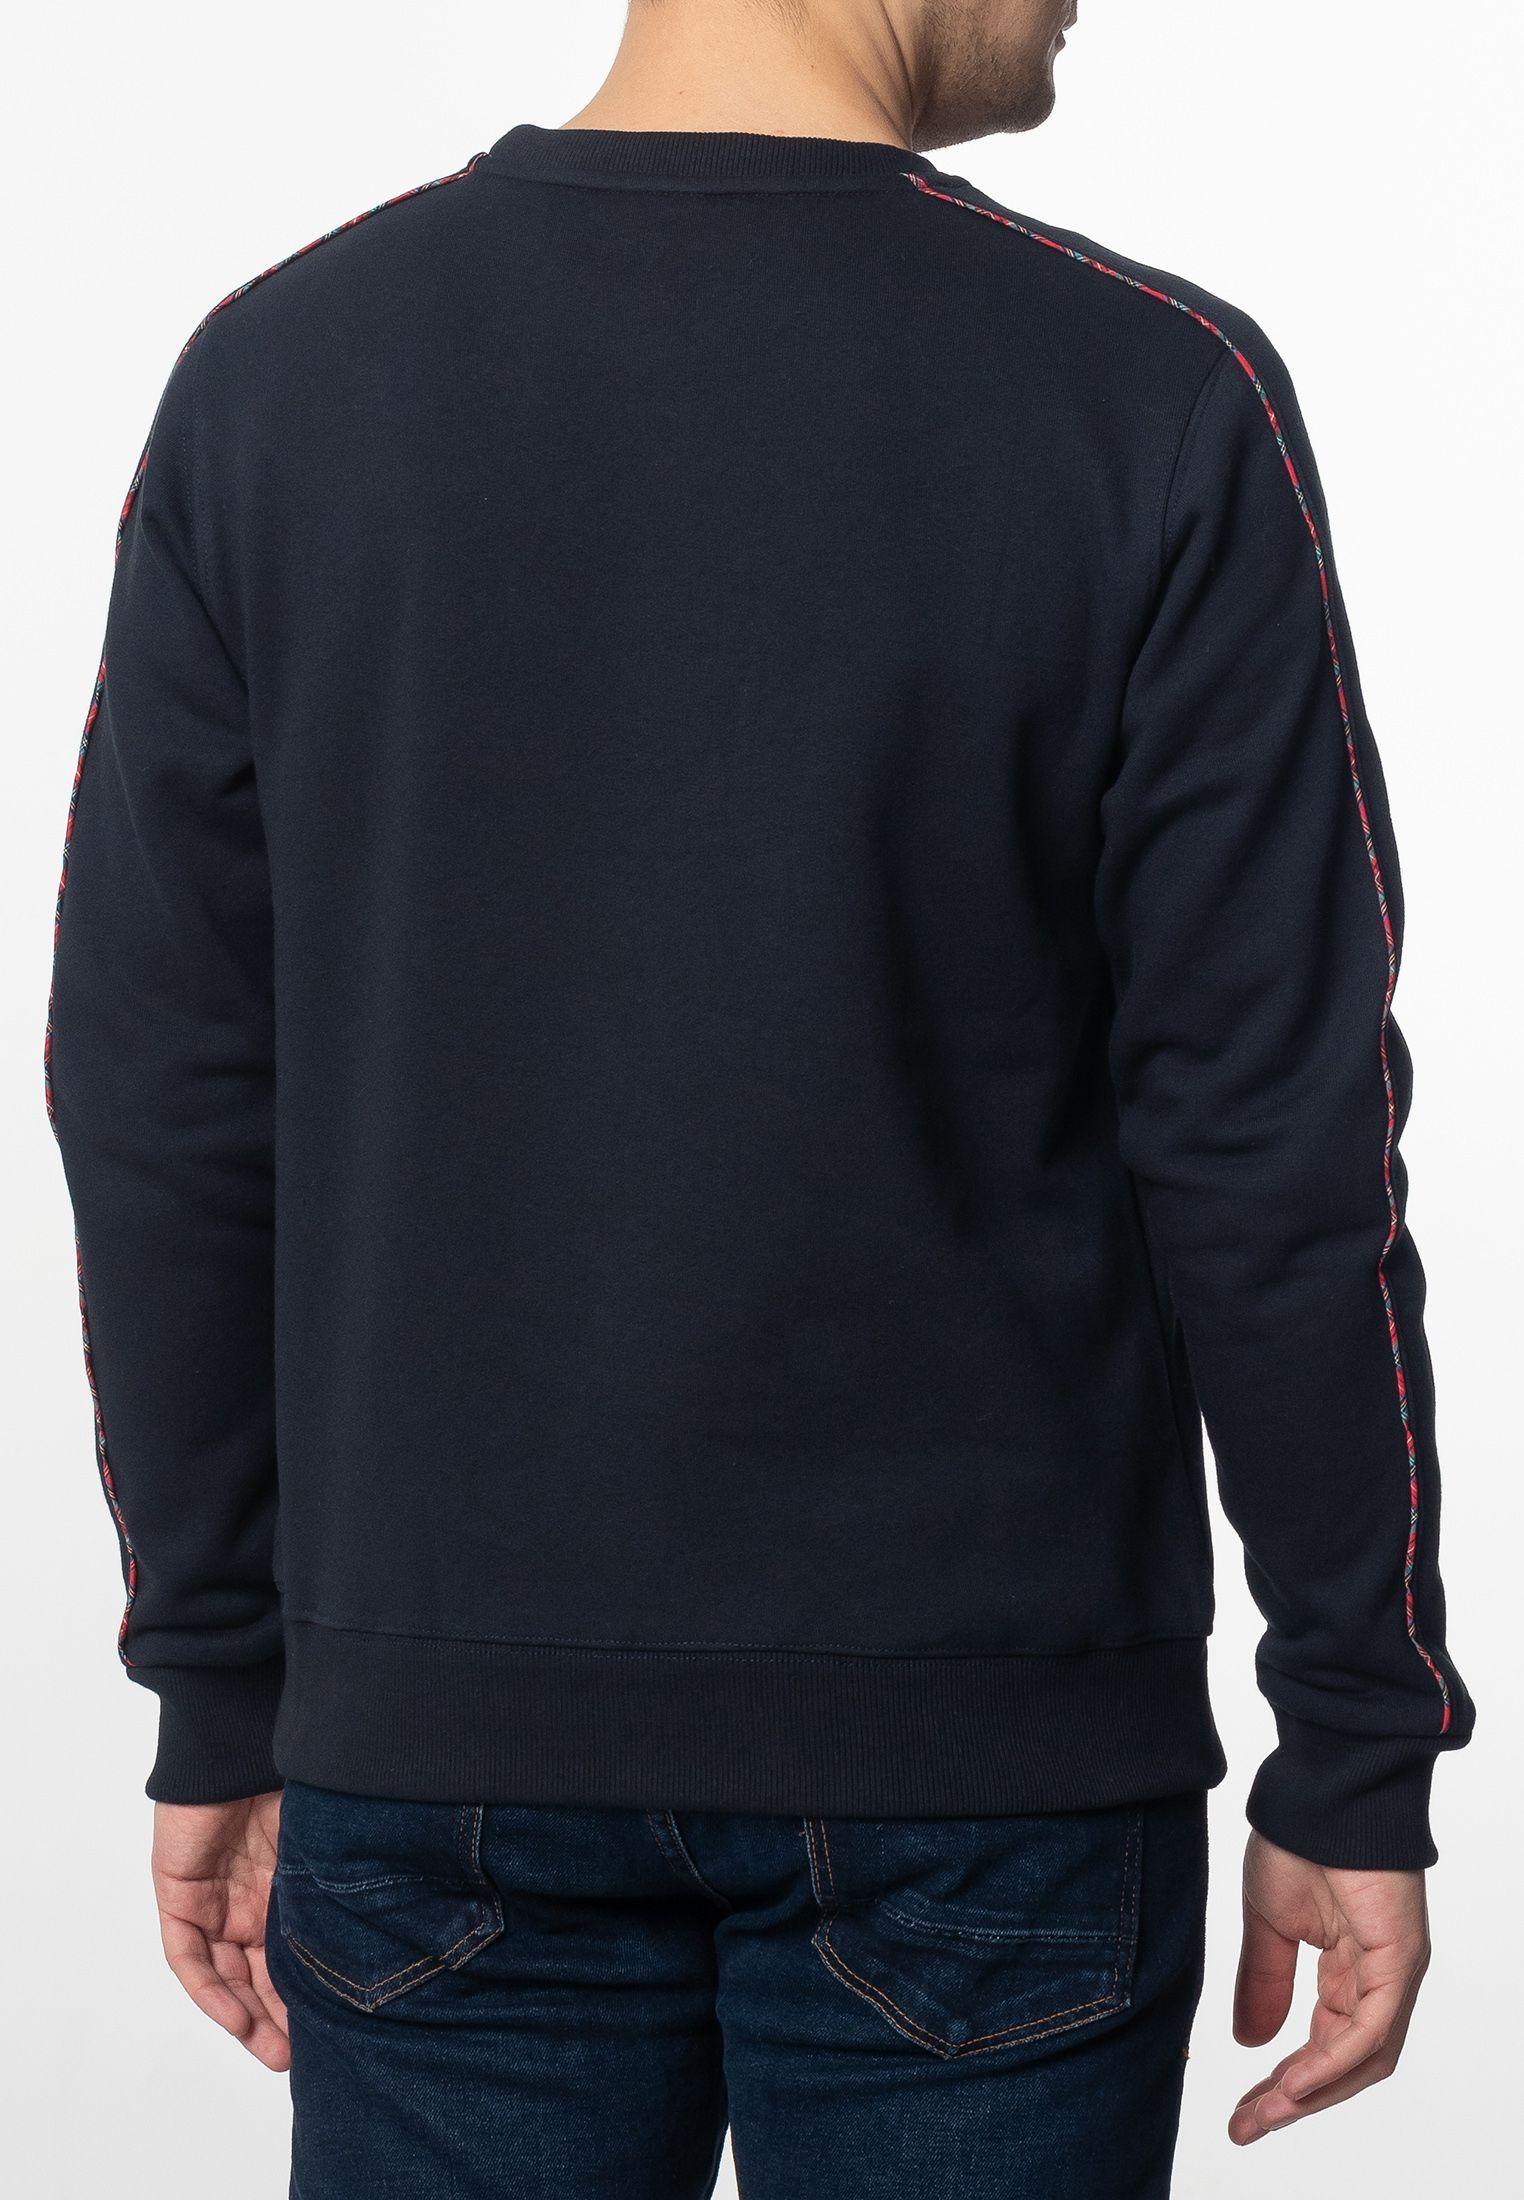 Norbury Mens Basic Sweatshirt With Tartan Piping Details In Navy